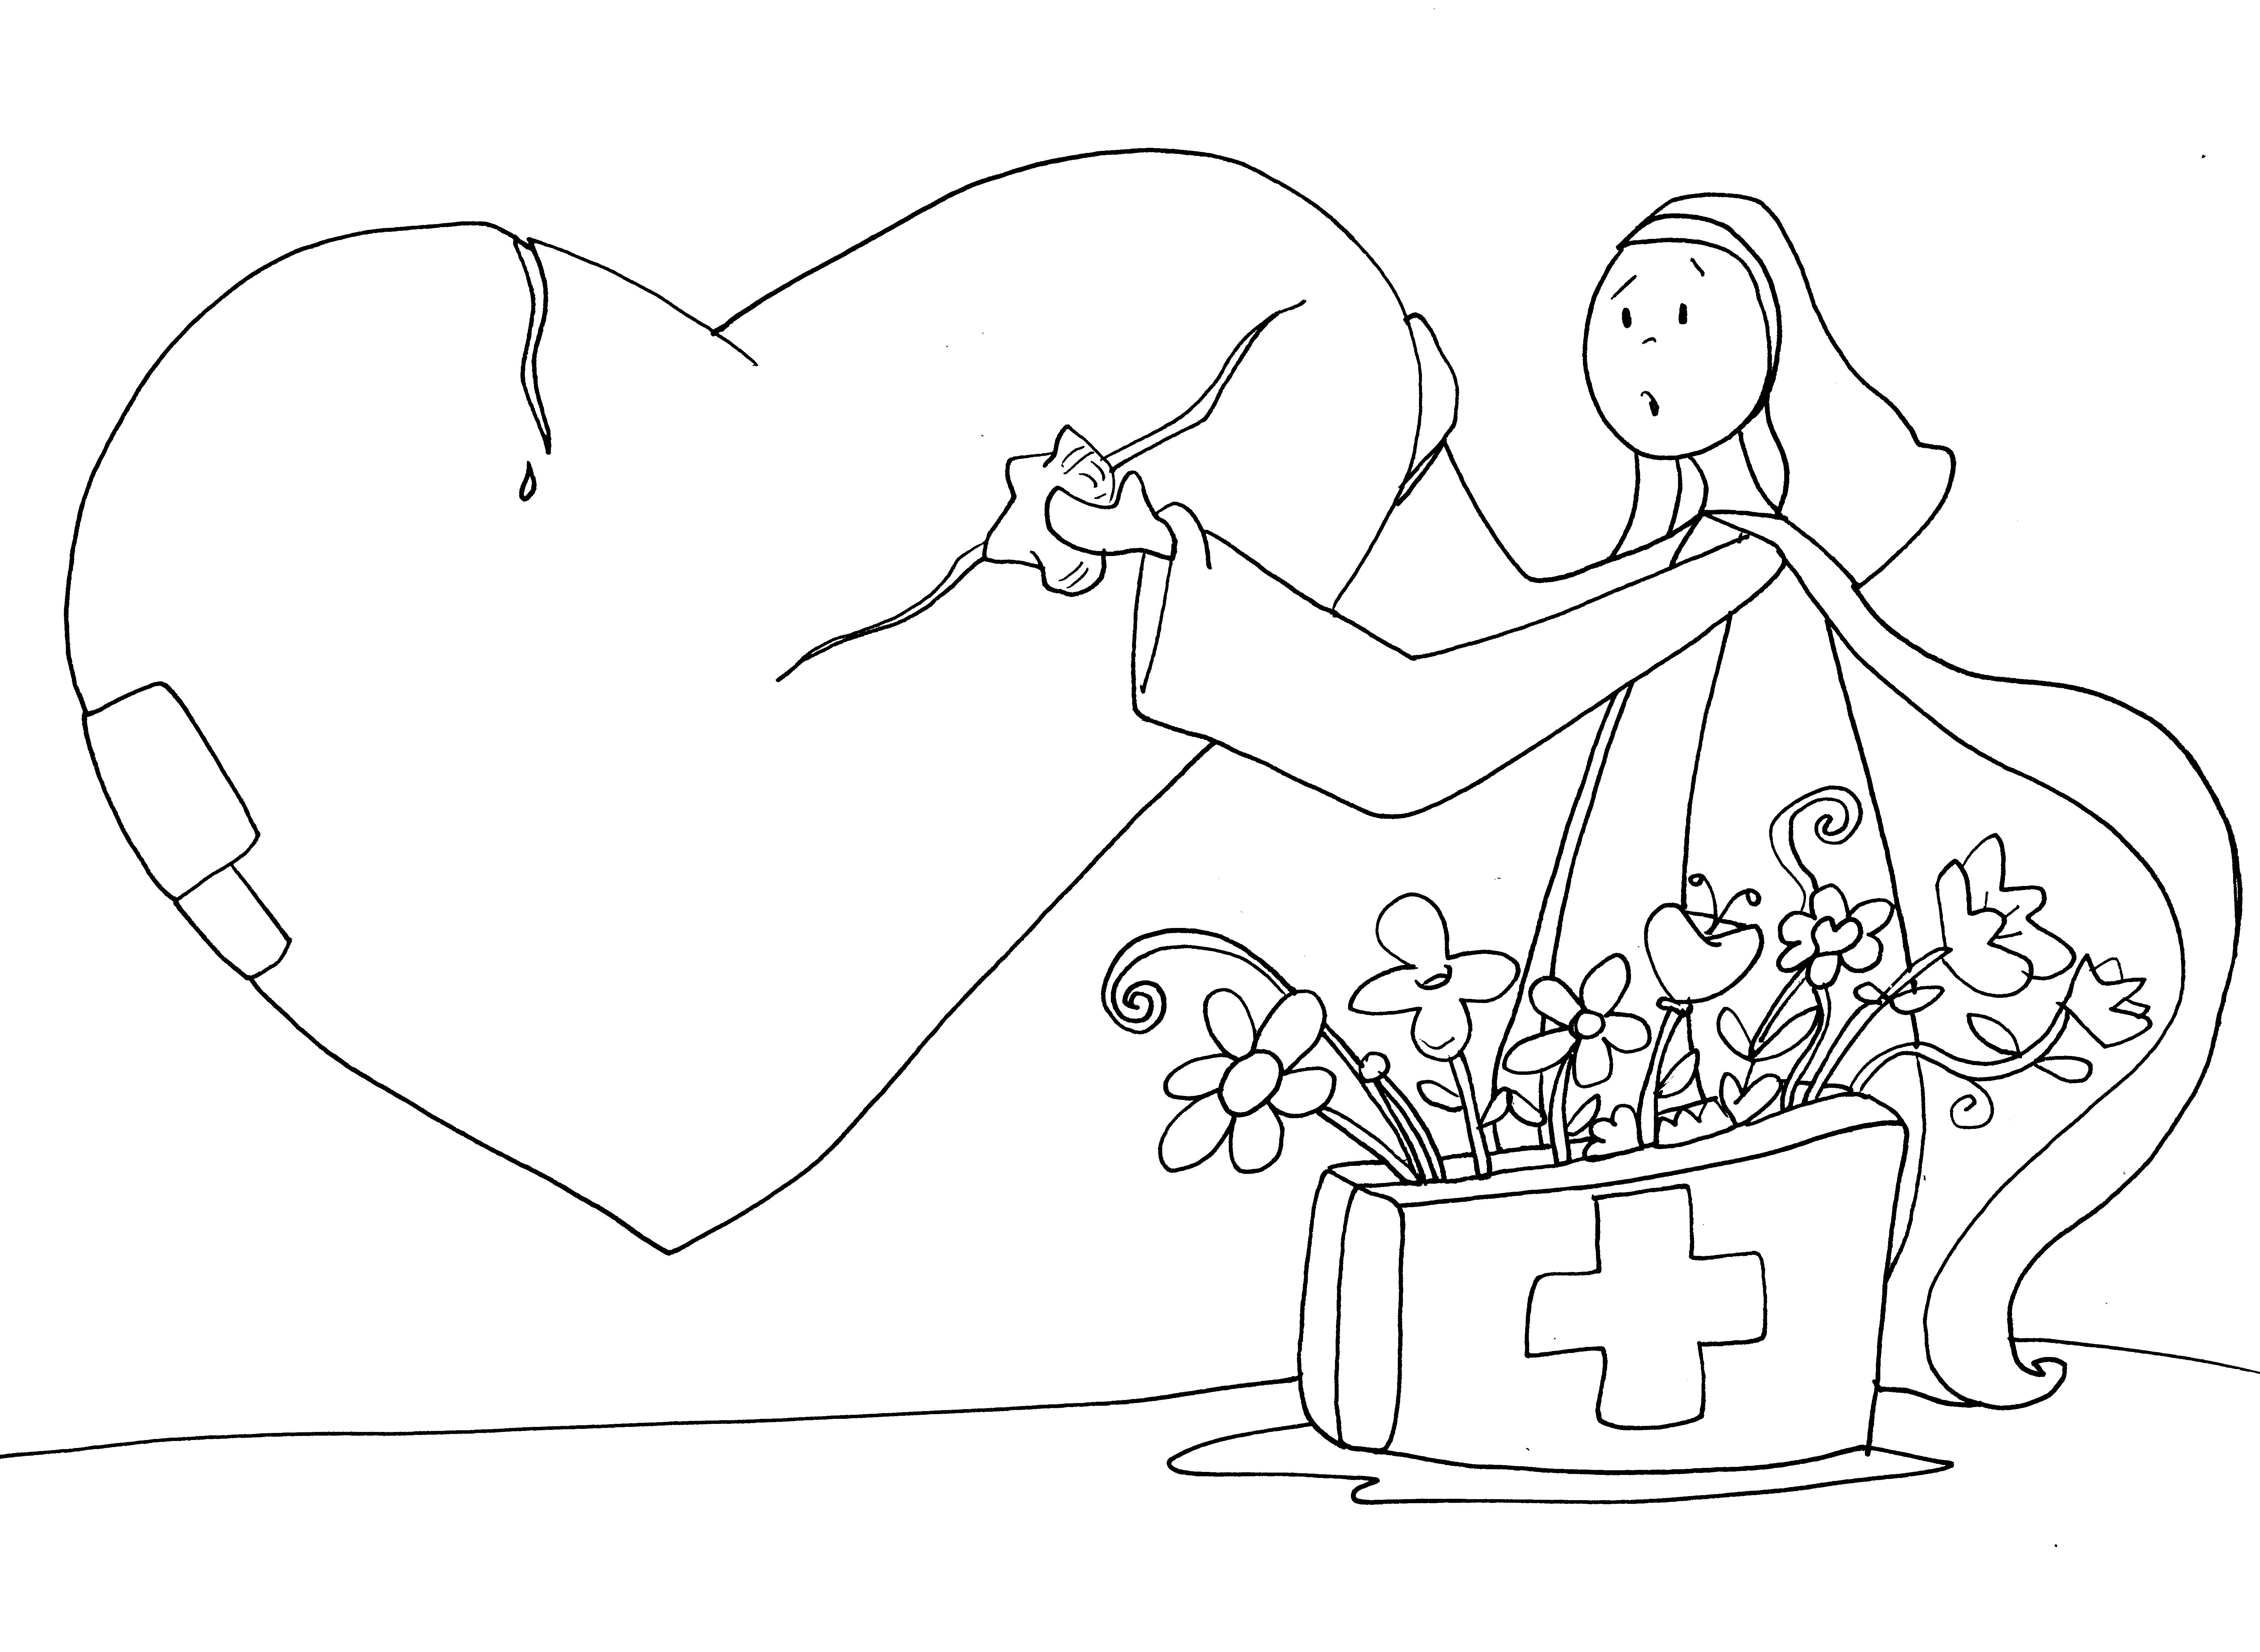 Teresa corazón roto   Teresa de Jesús   Pinterest   Corazón roto y ...